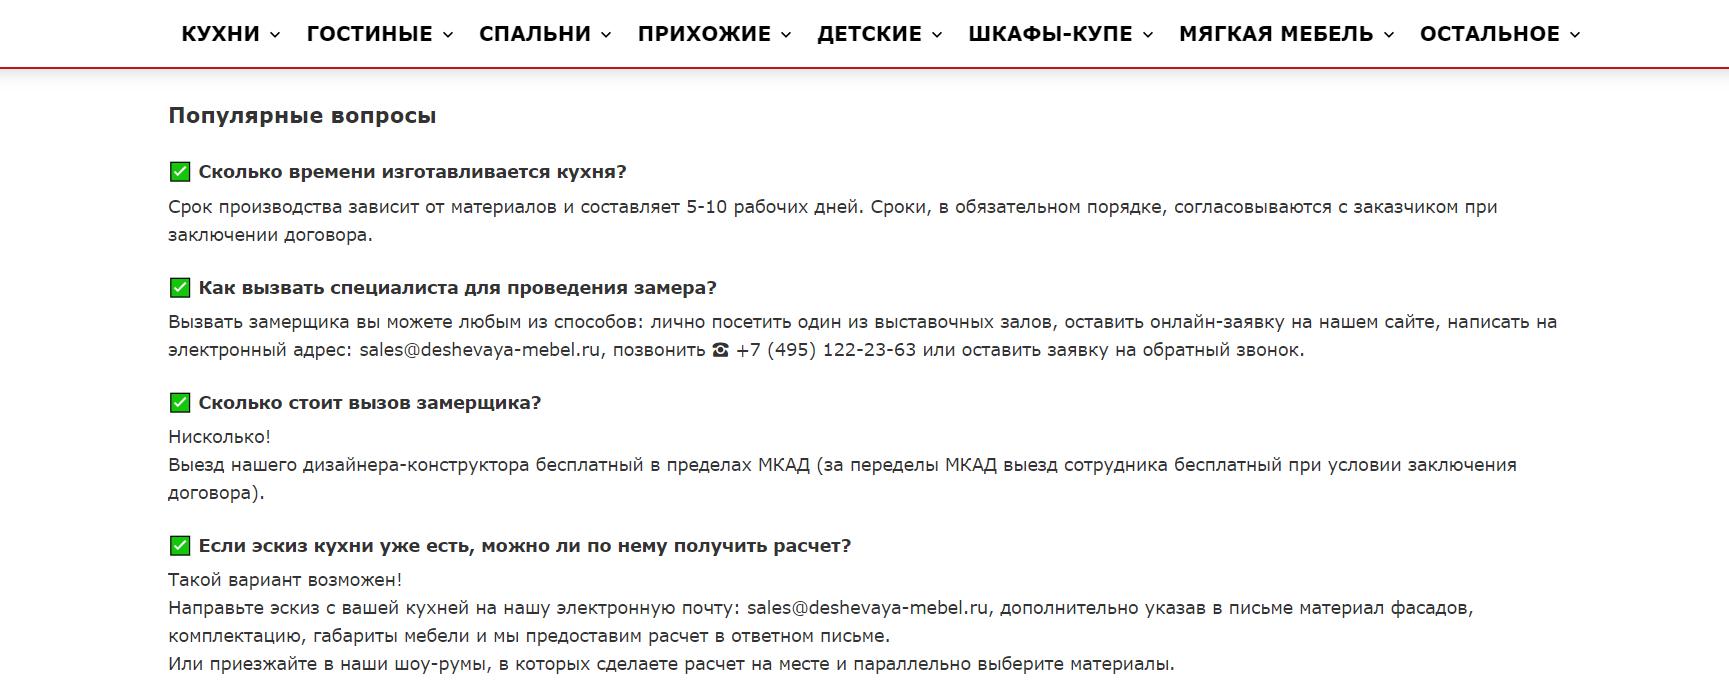 "FAQ в категории товаров ""Кухни"""